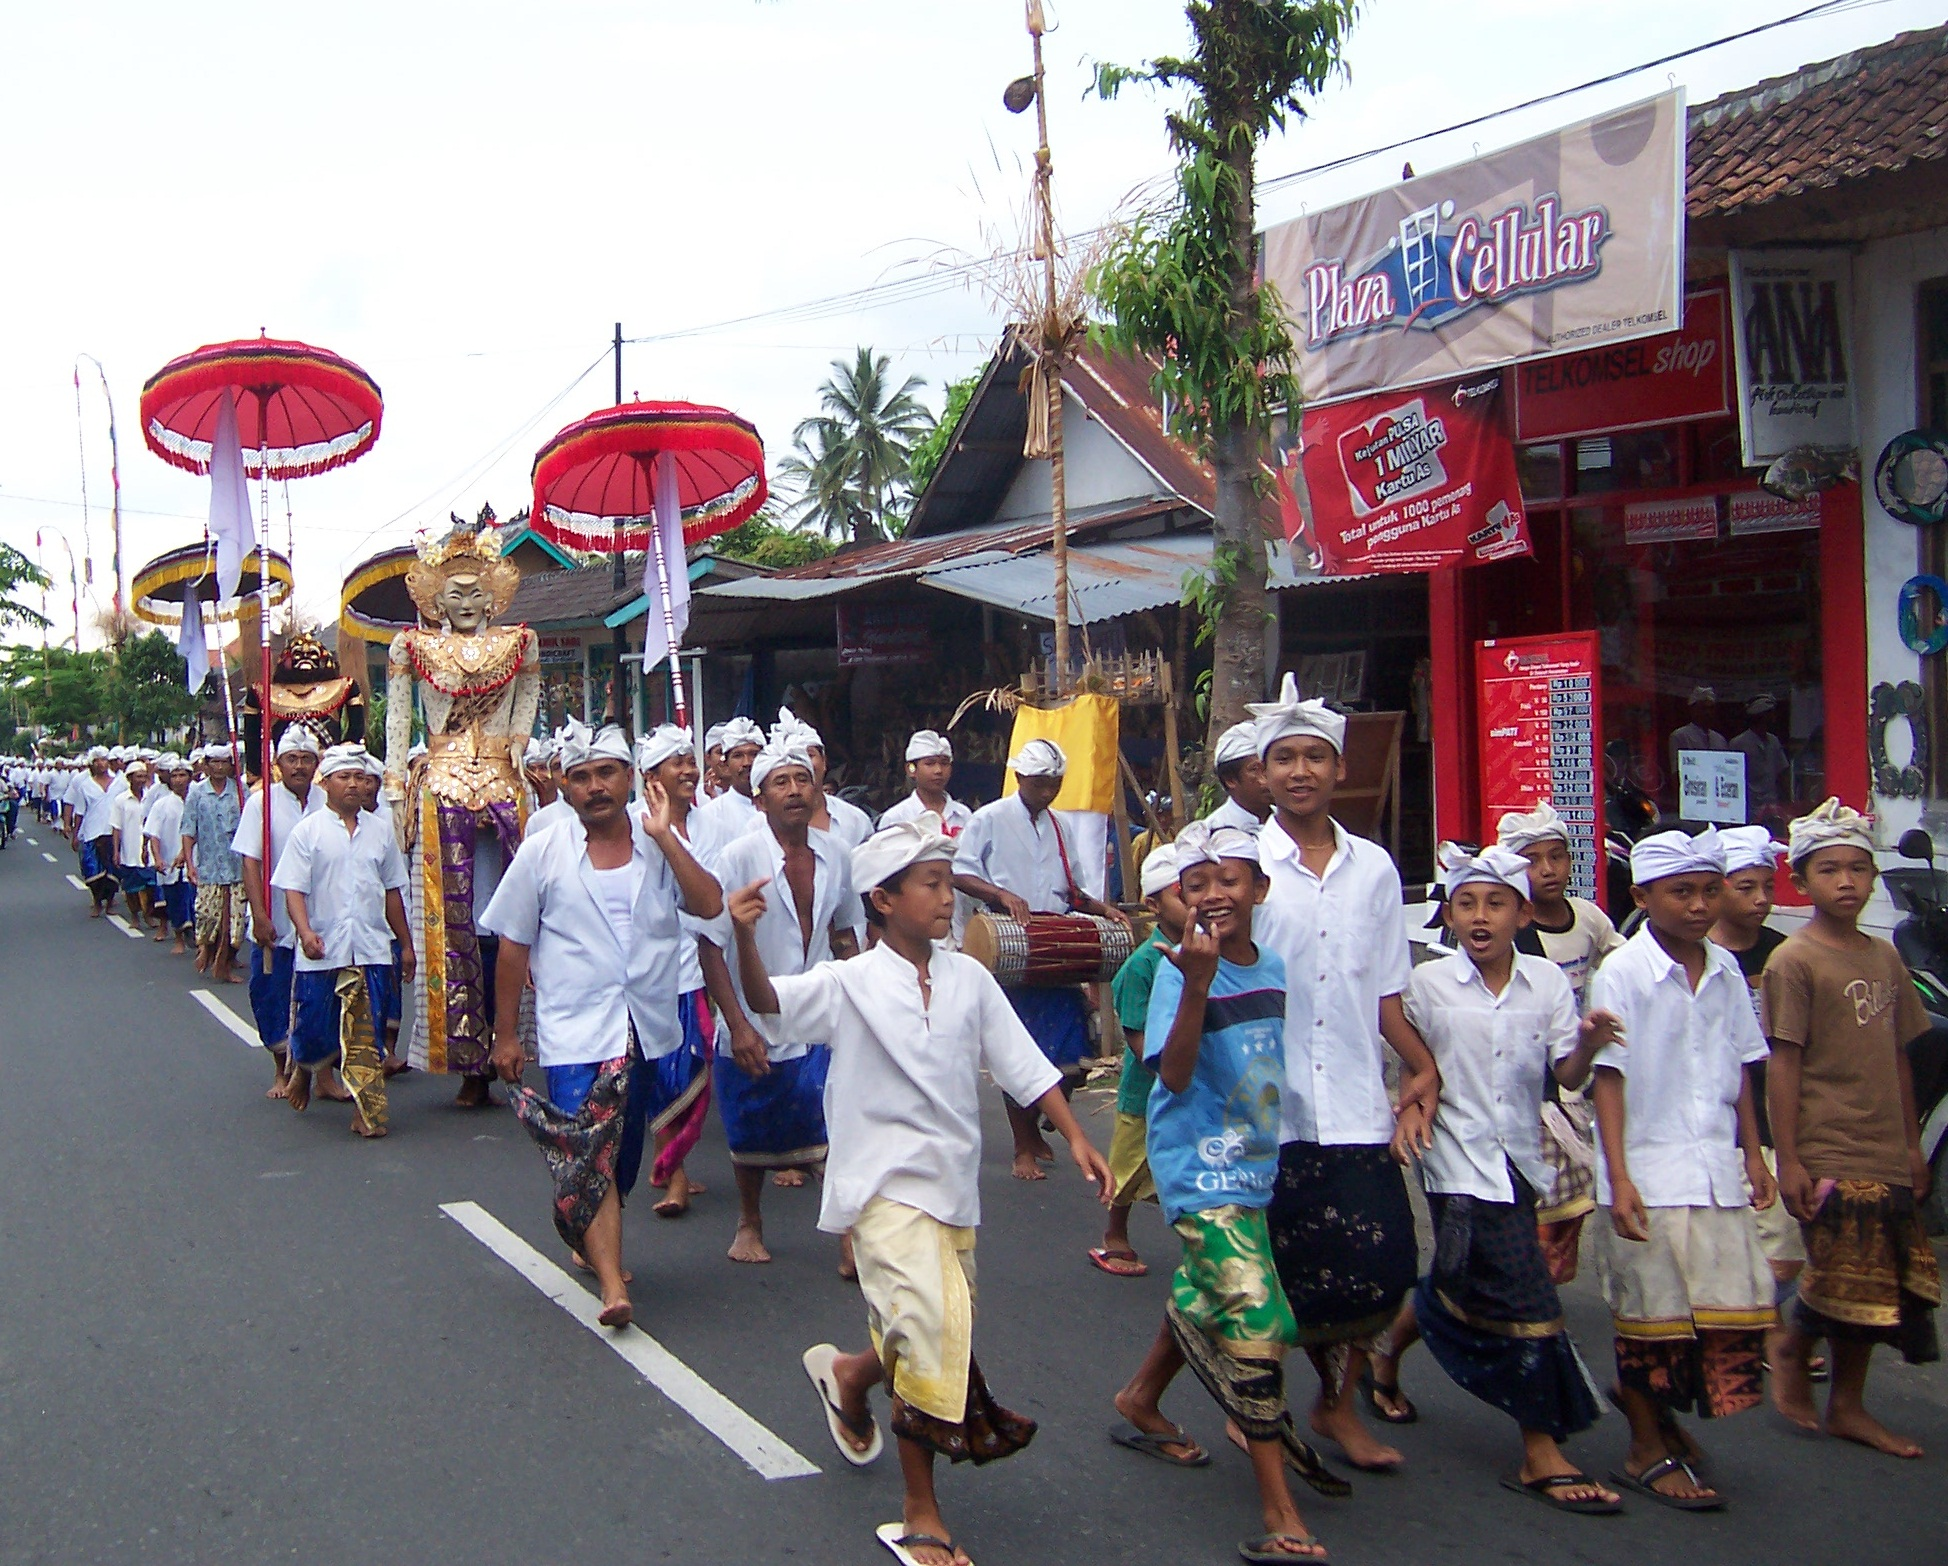 https://upload.wikimedia.org/wikipedia/commons/1/1f/BaliPerarakan.jpg